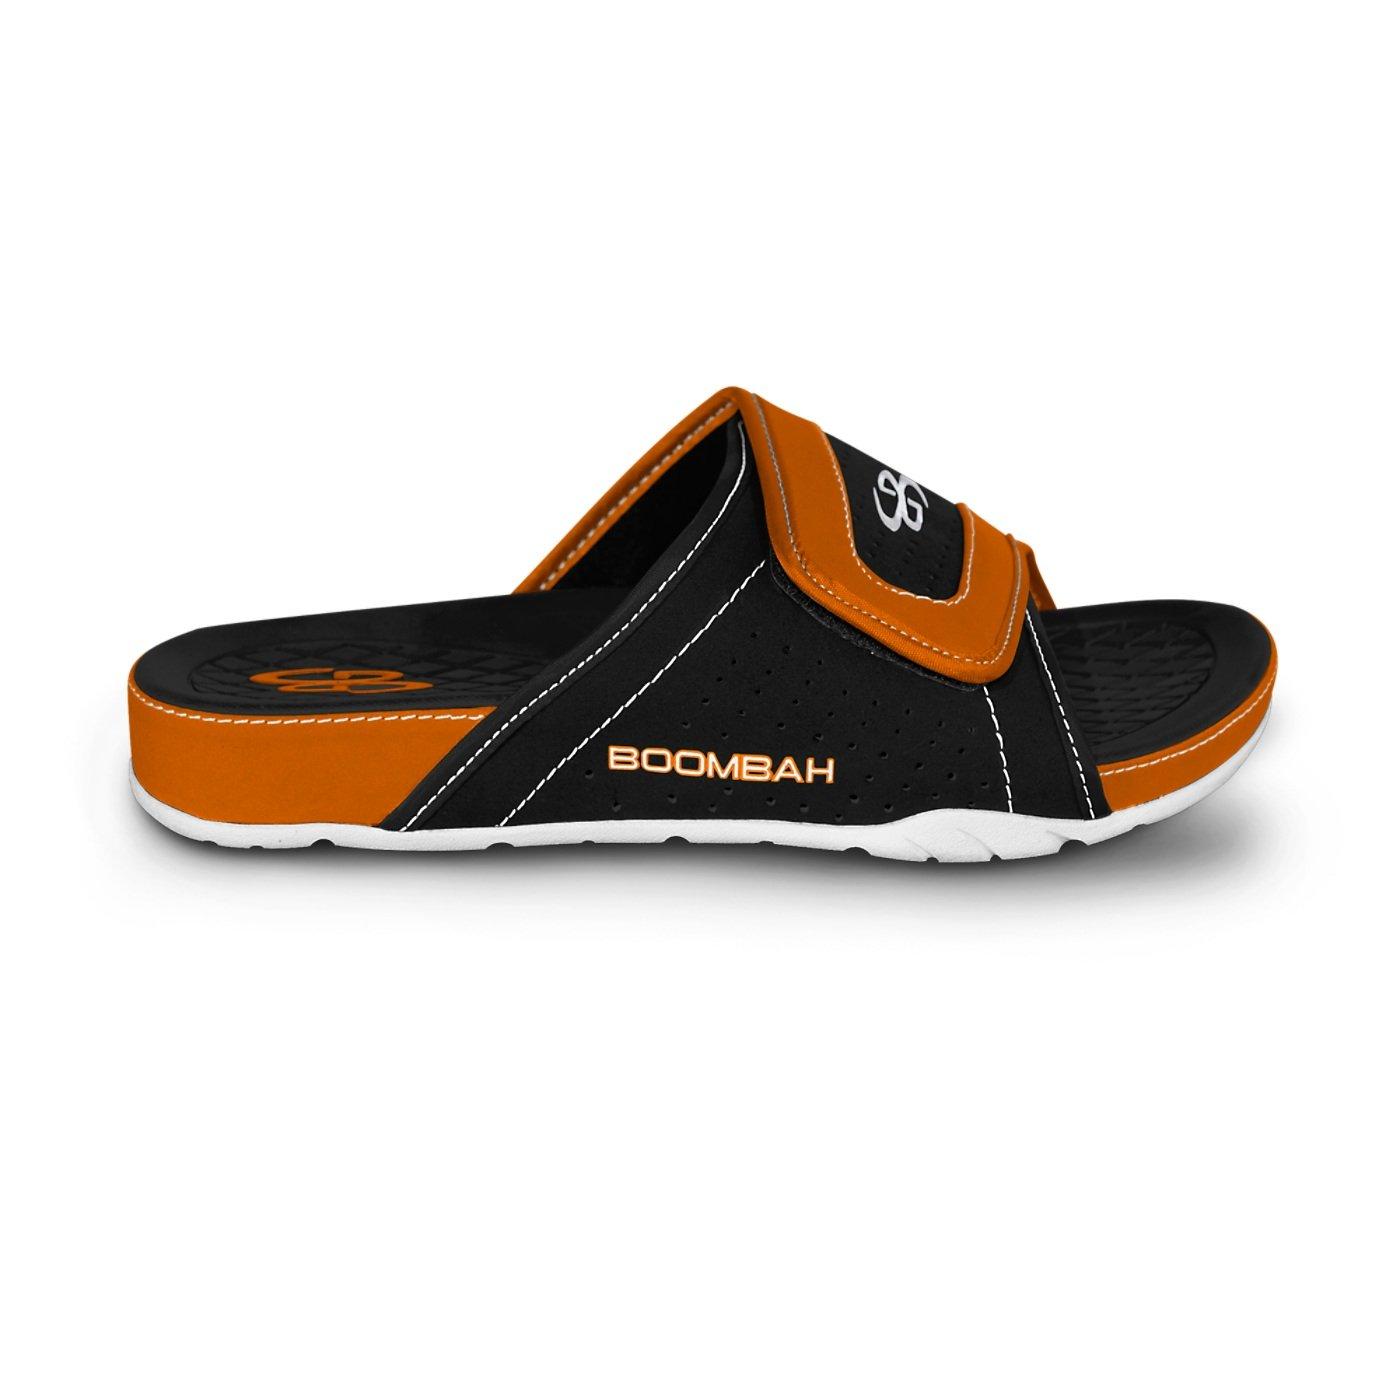 Boombah Men's Tyrant Slide Sandals - 32 Color Options - Multiple Sizes B077NQW3L7 8|Black/Orange